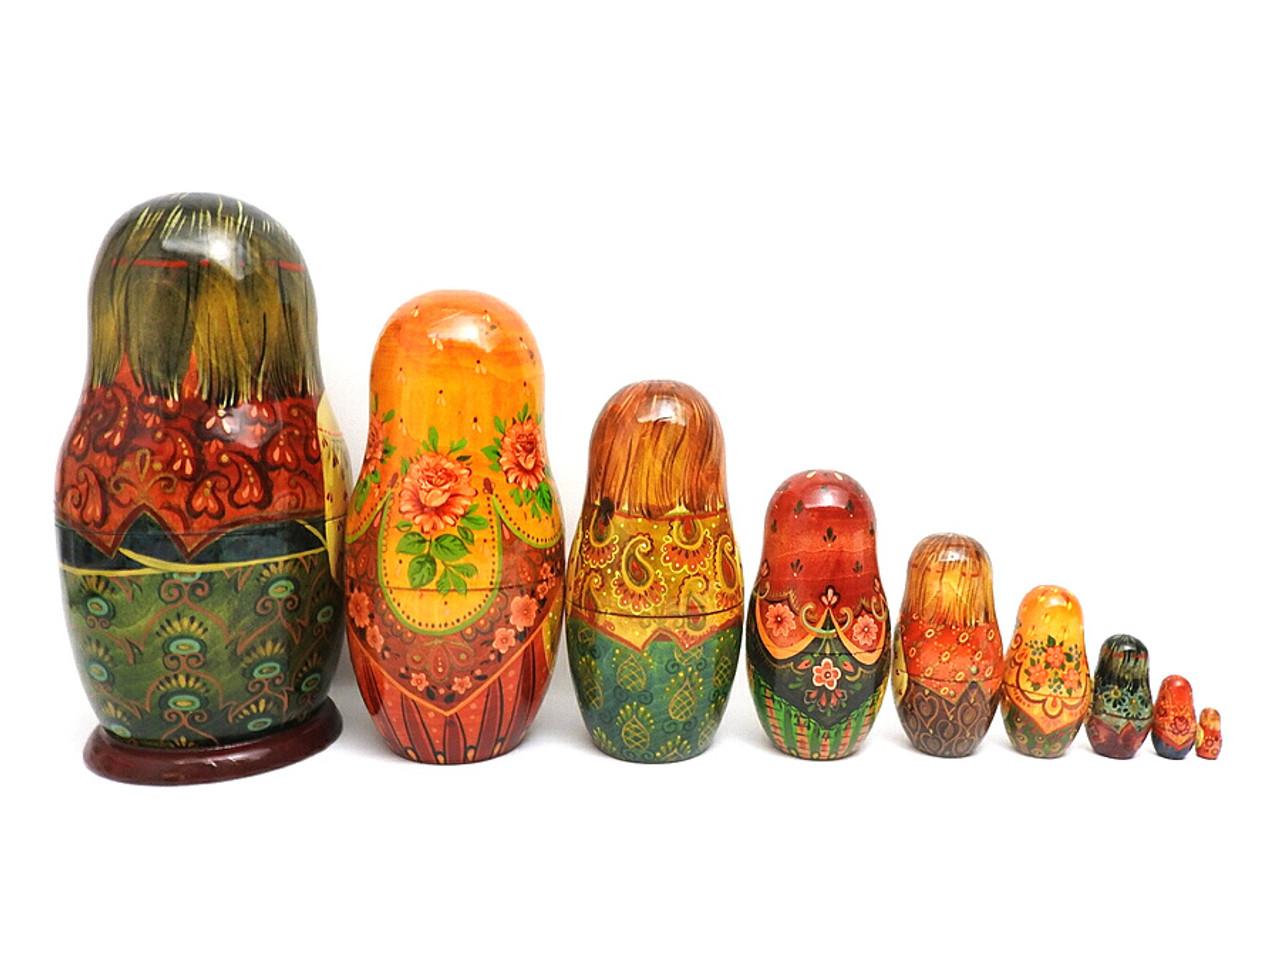 Russian Peasant Family Artistic Matryoshka Doll Backs of Doll